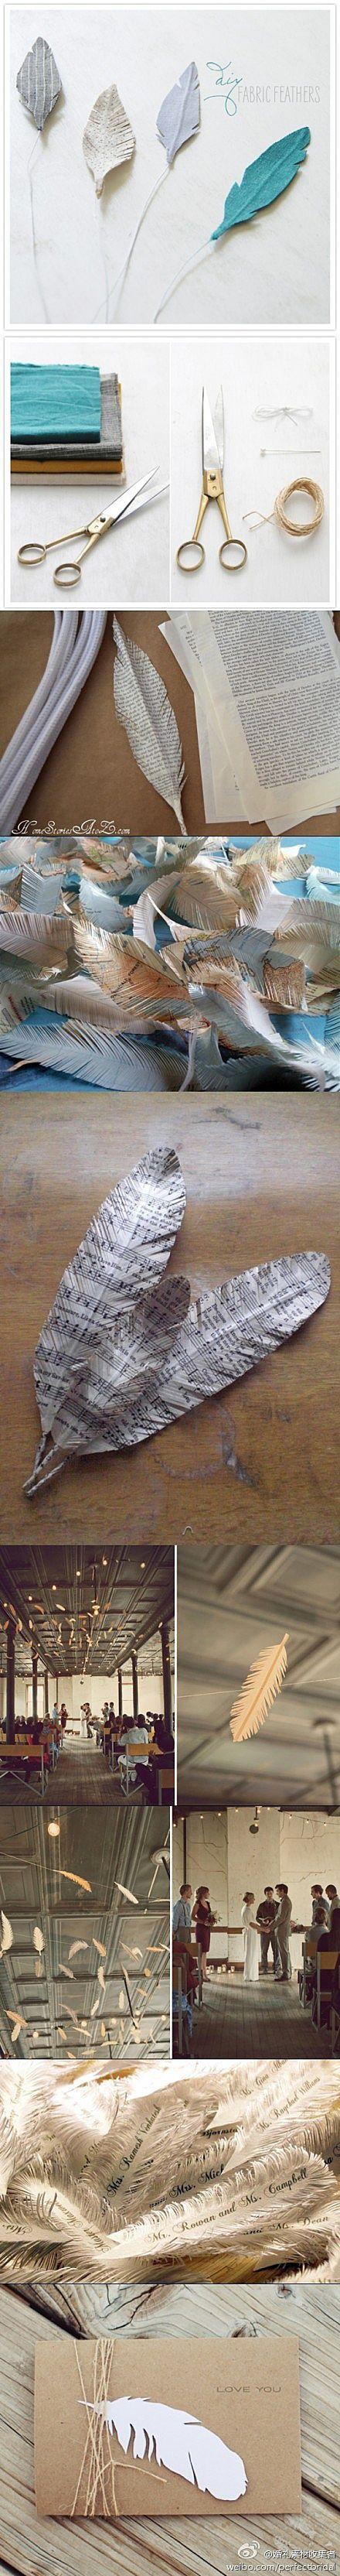 handmade feathers.